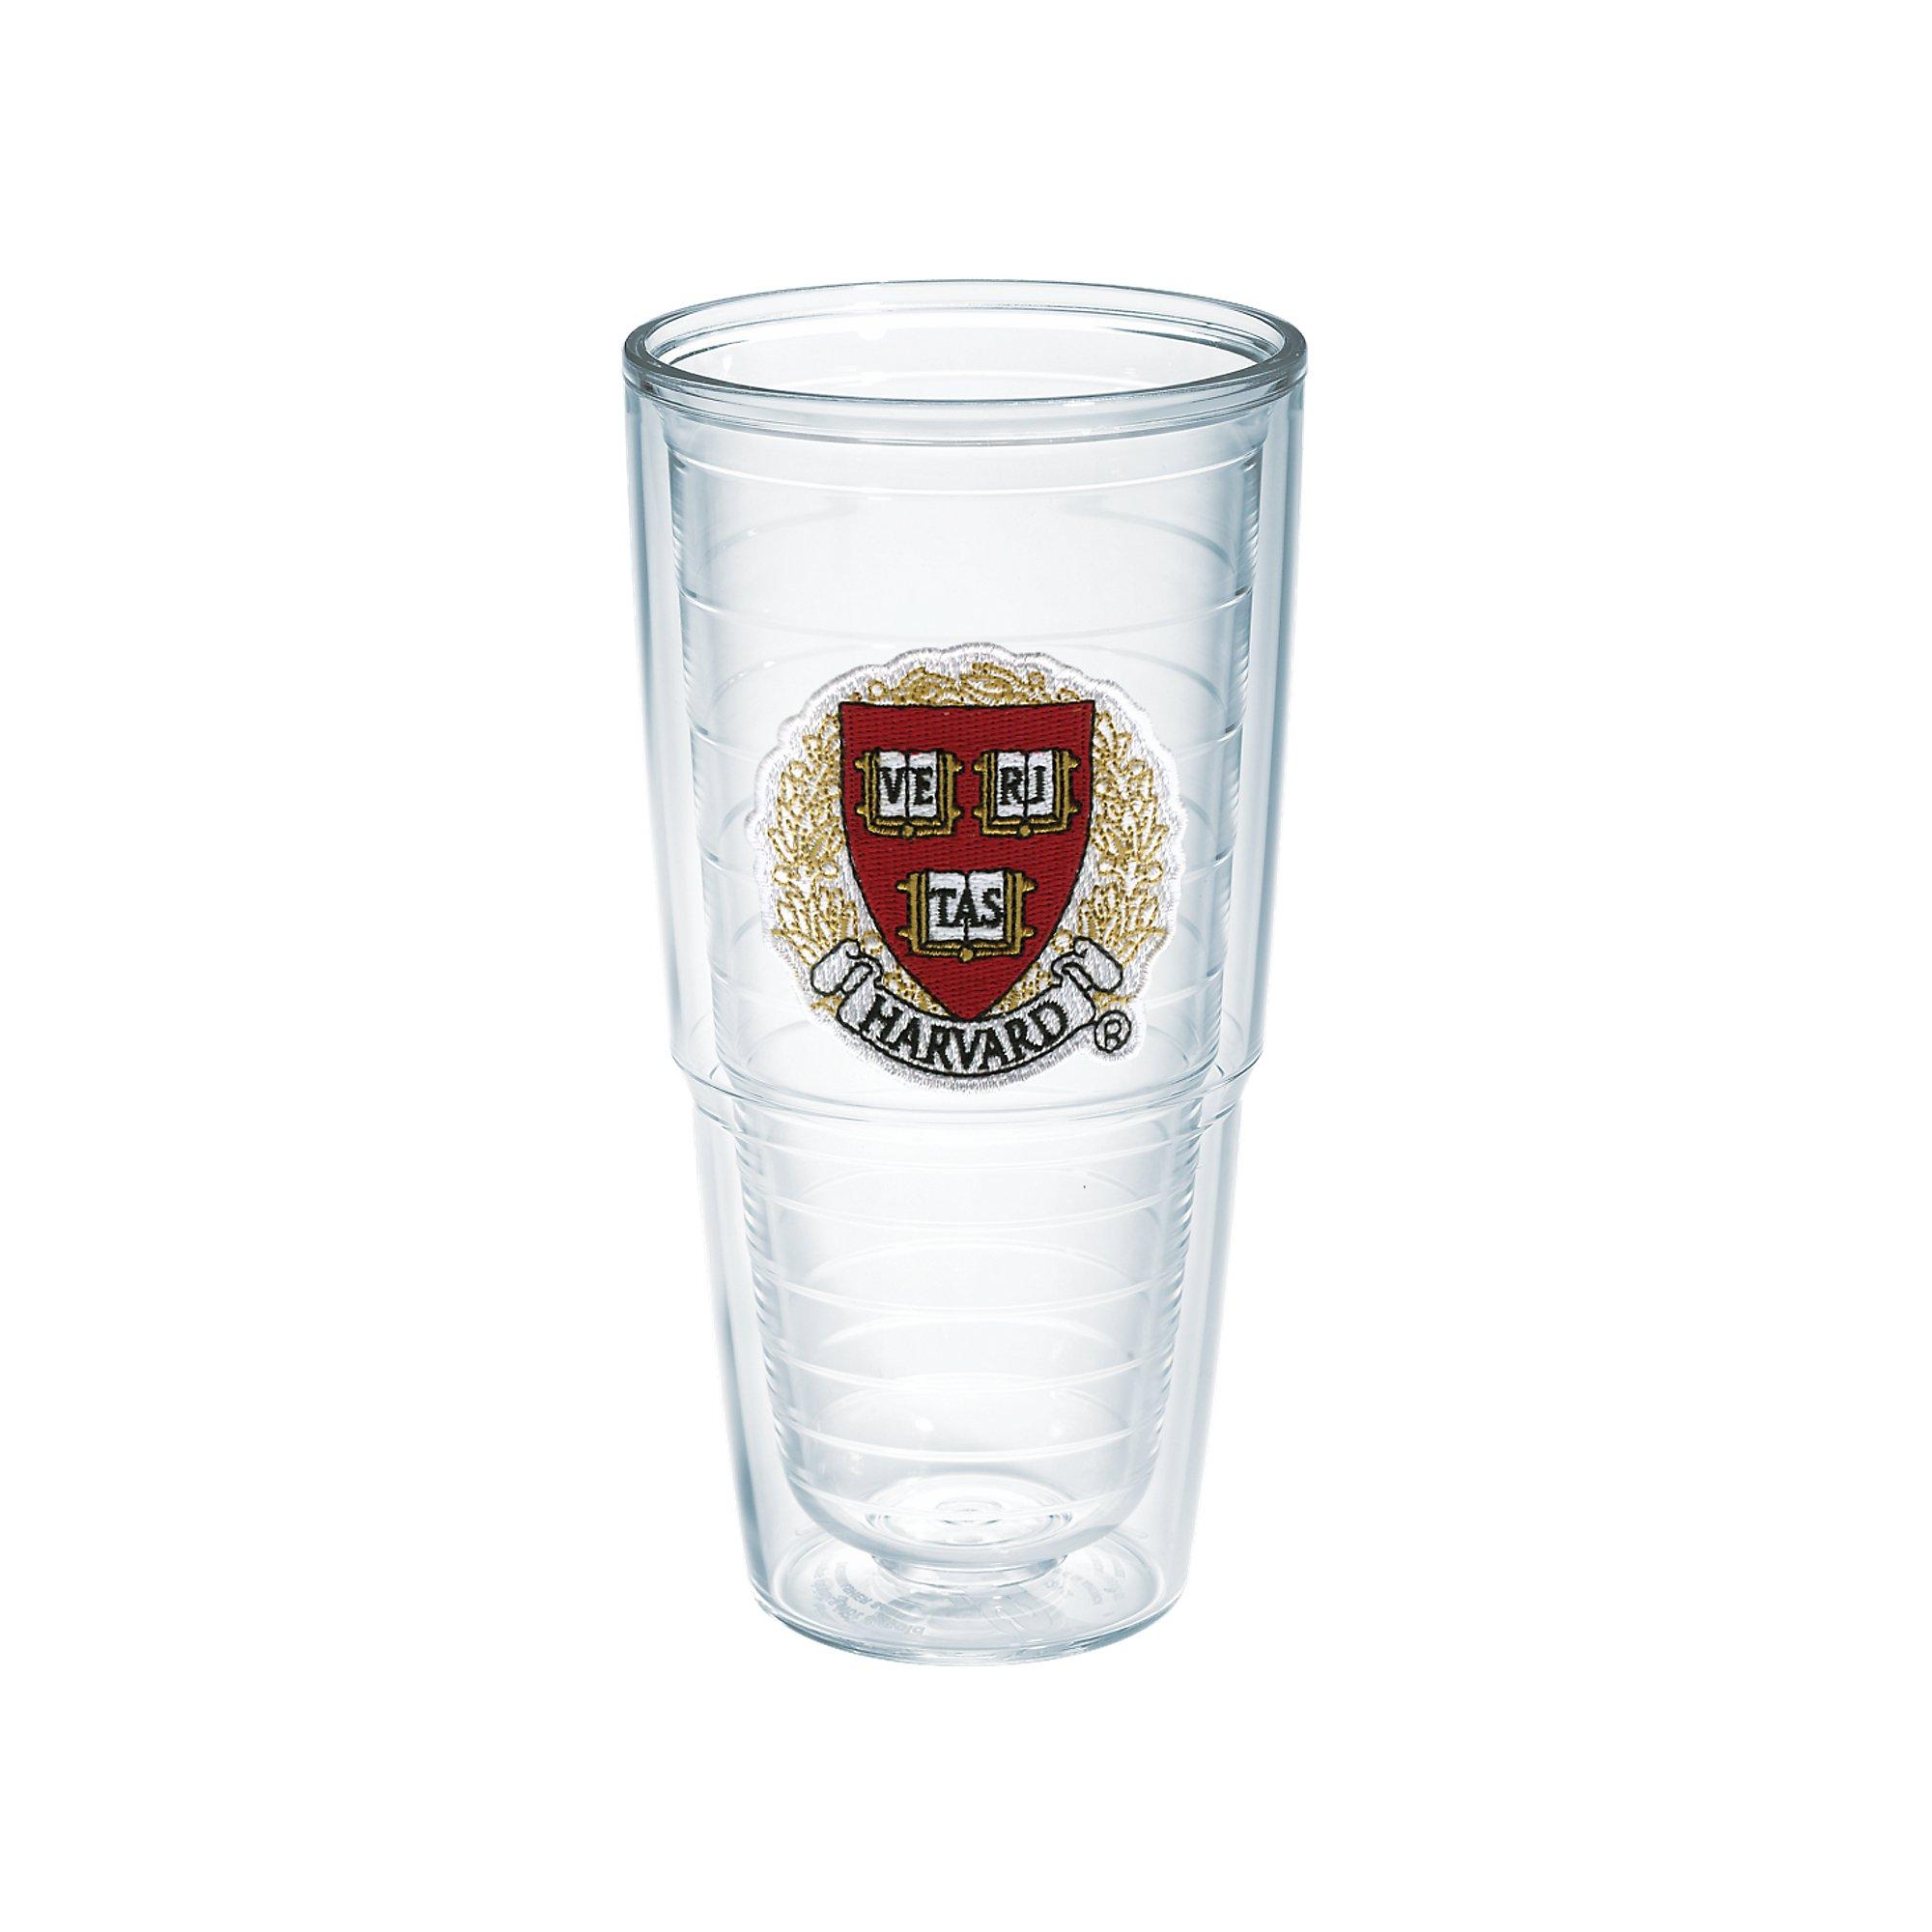 Tervis 1041493 Harvard University Veritas Emblem Individual Tumbler, 24 oz, Clear